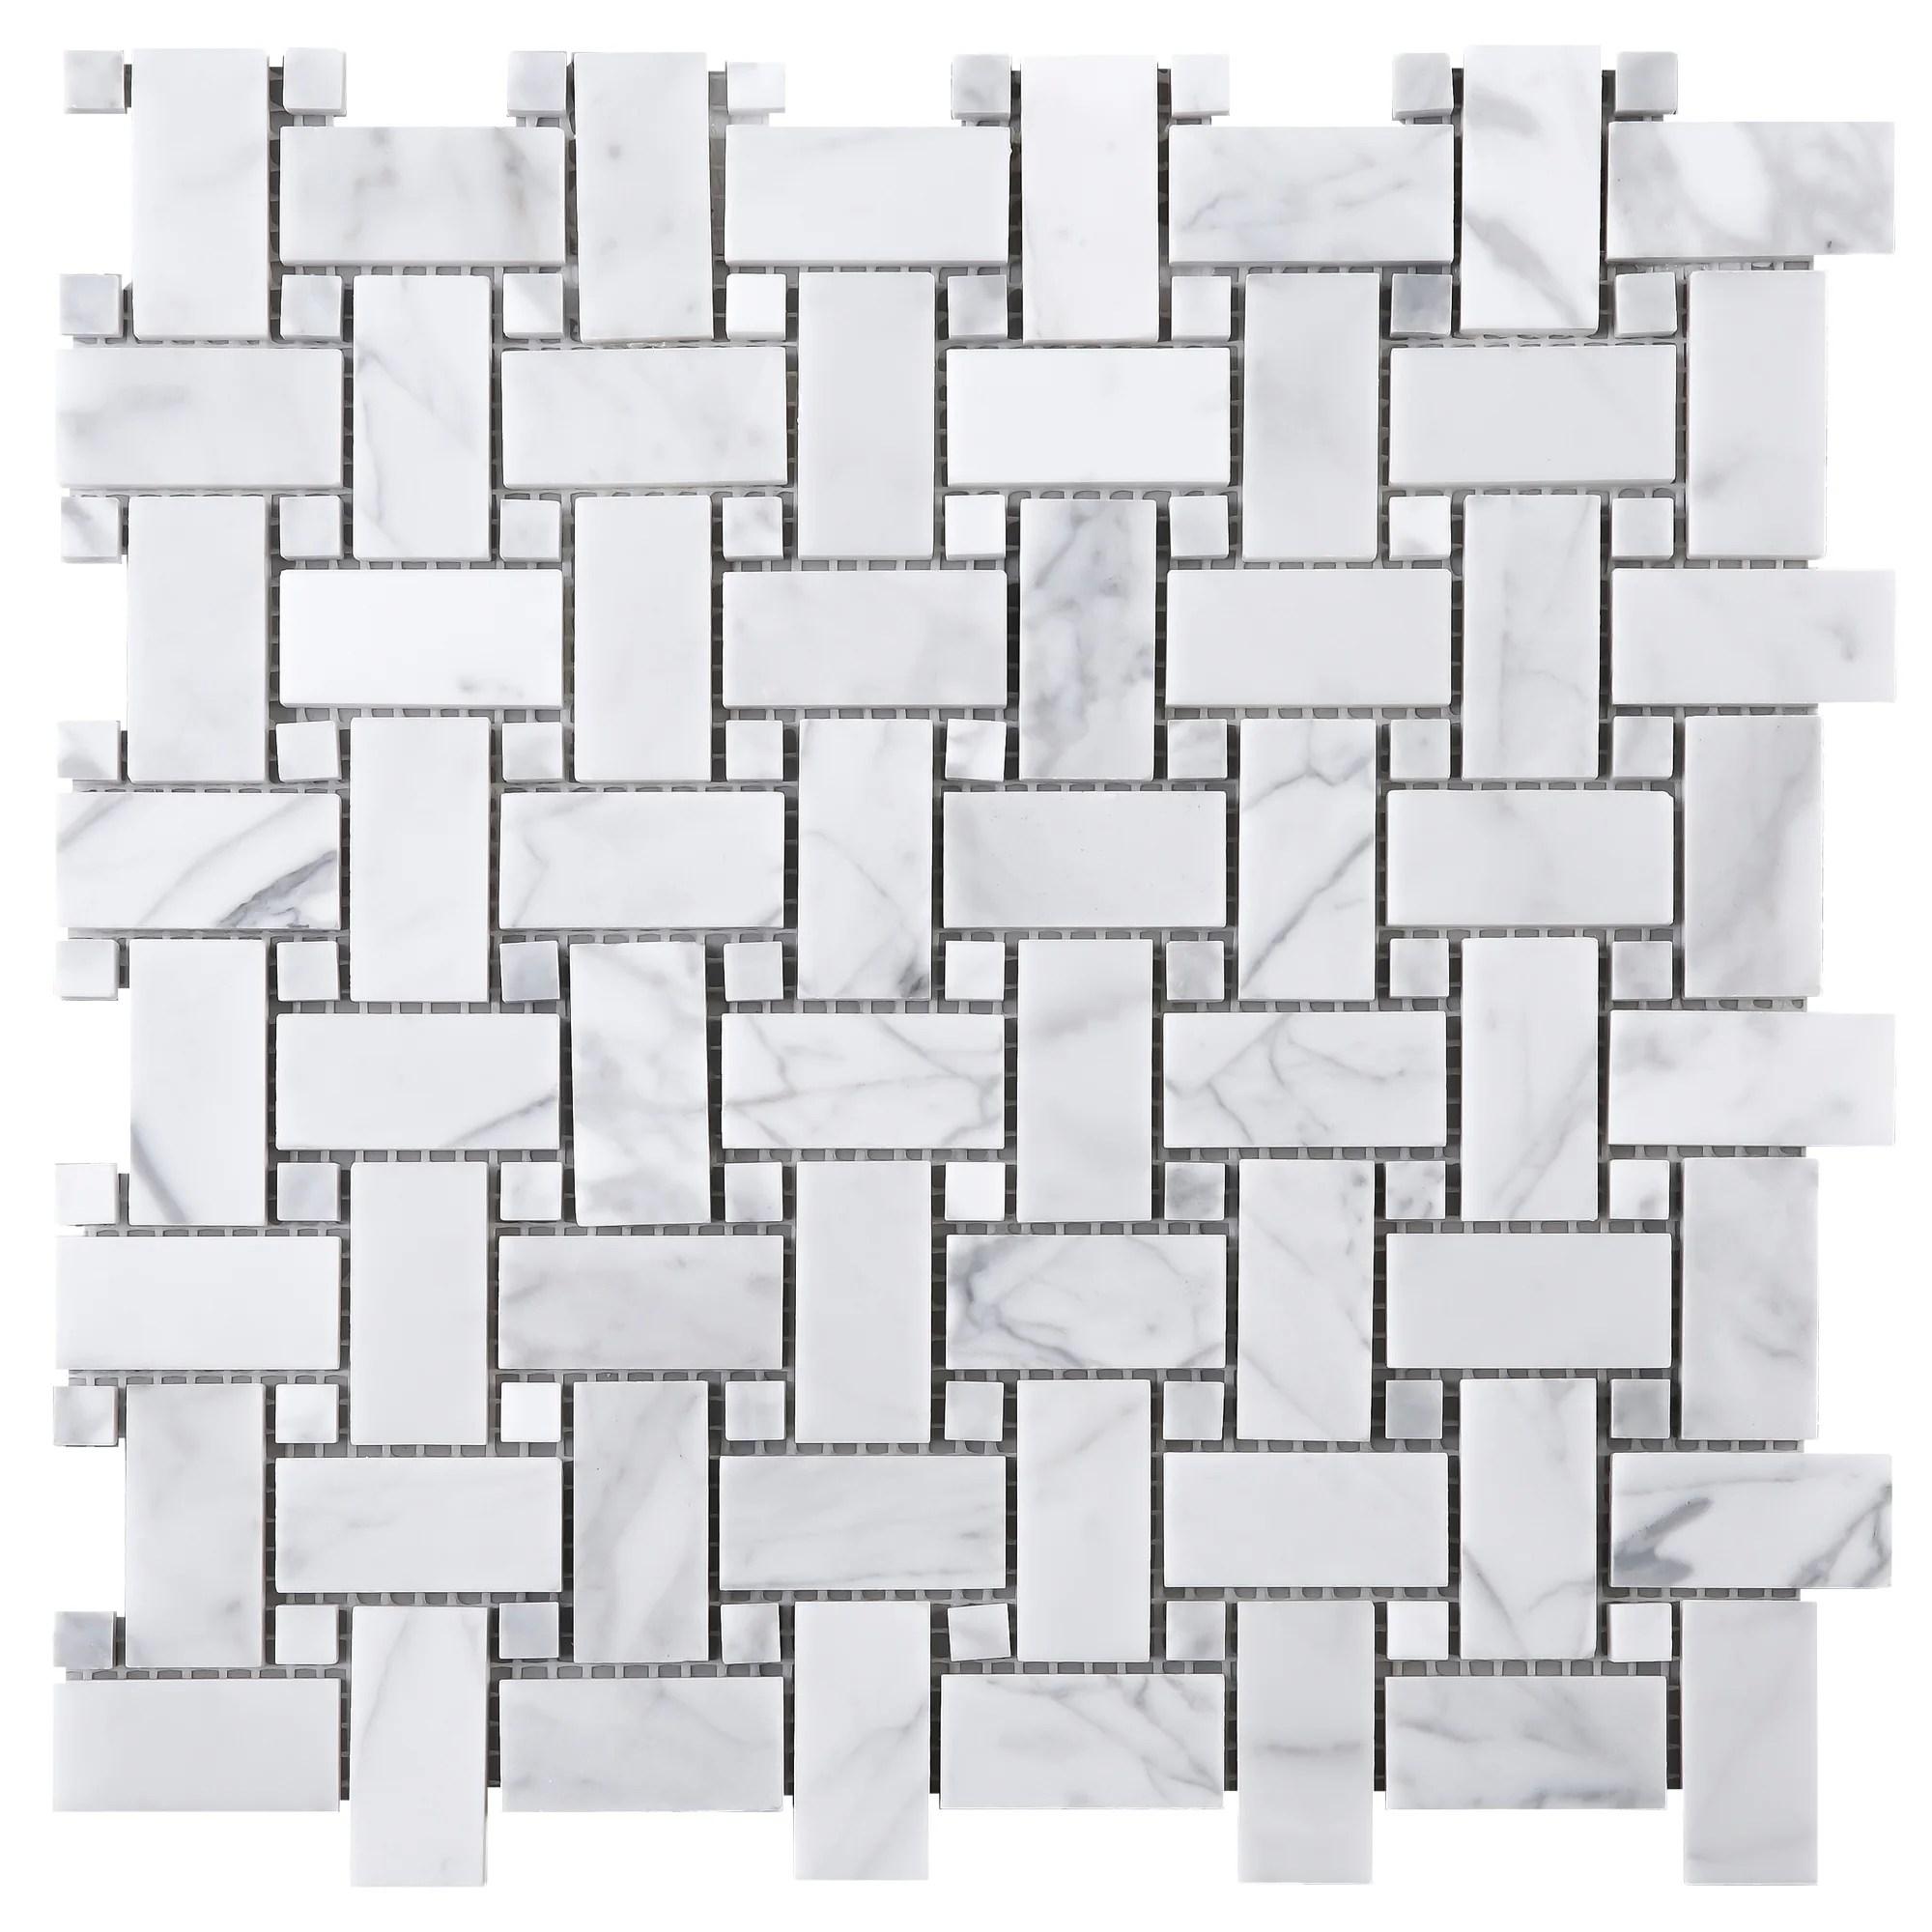 tilegen 1 x 2 basket weave white carrarra marble mosaic tile in white floor and wall tile 10 sheets 9 6sqft